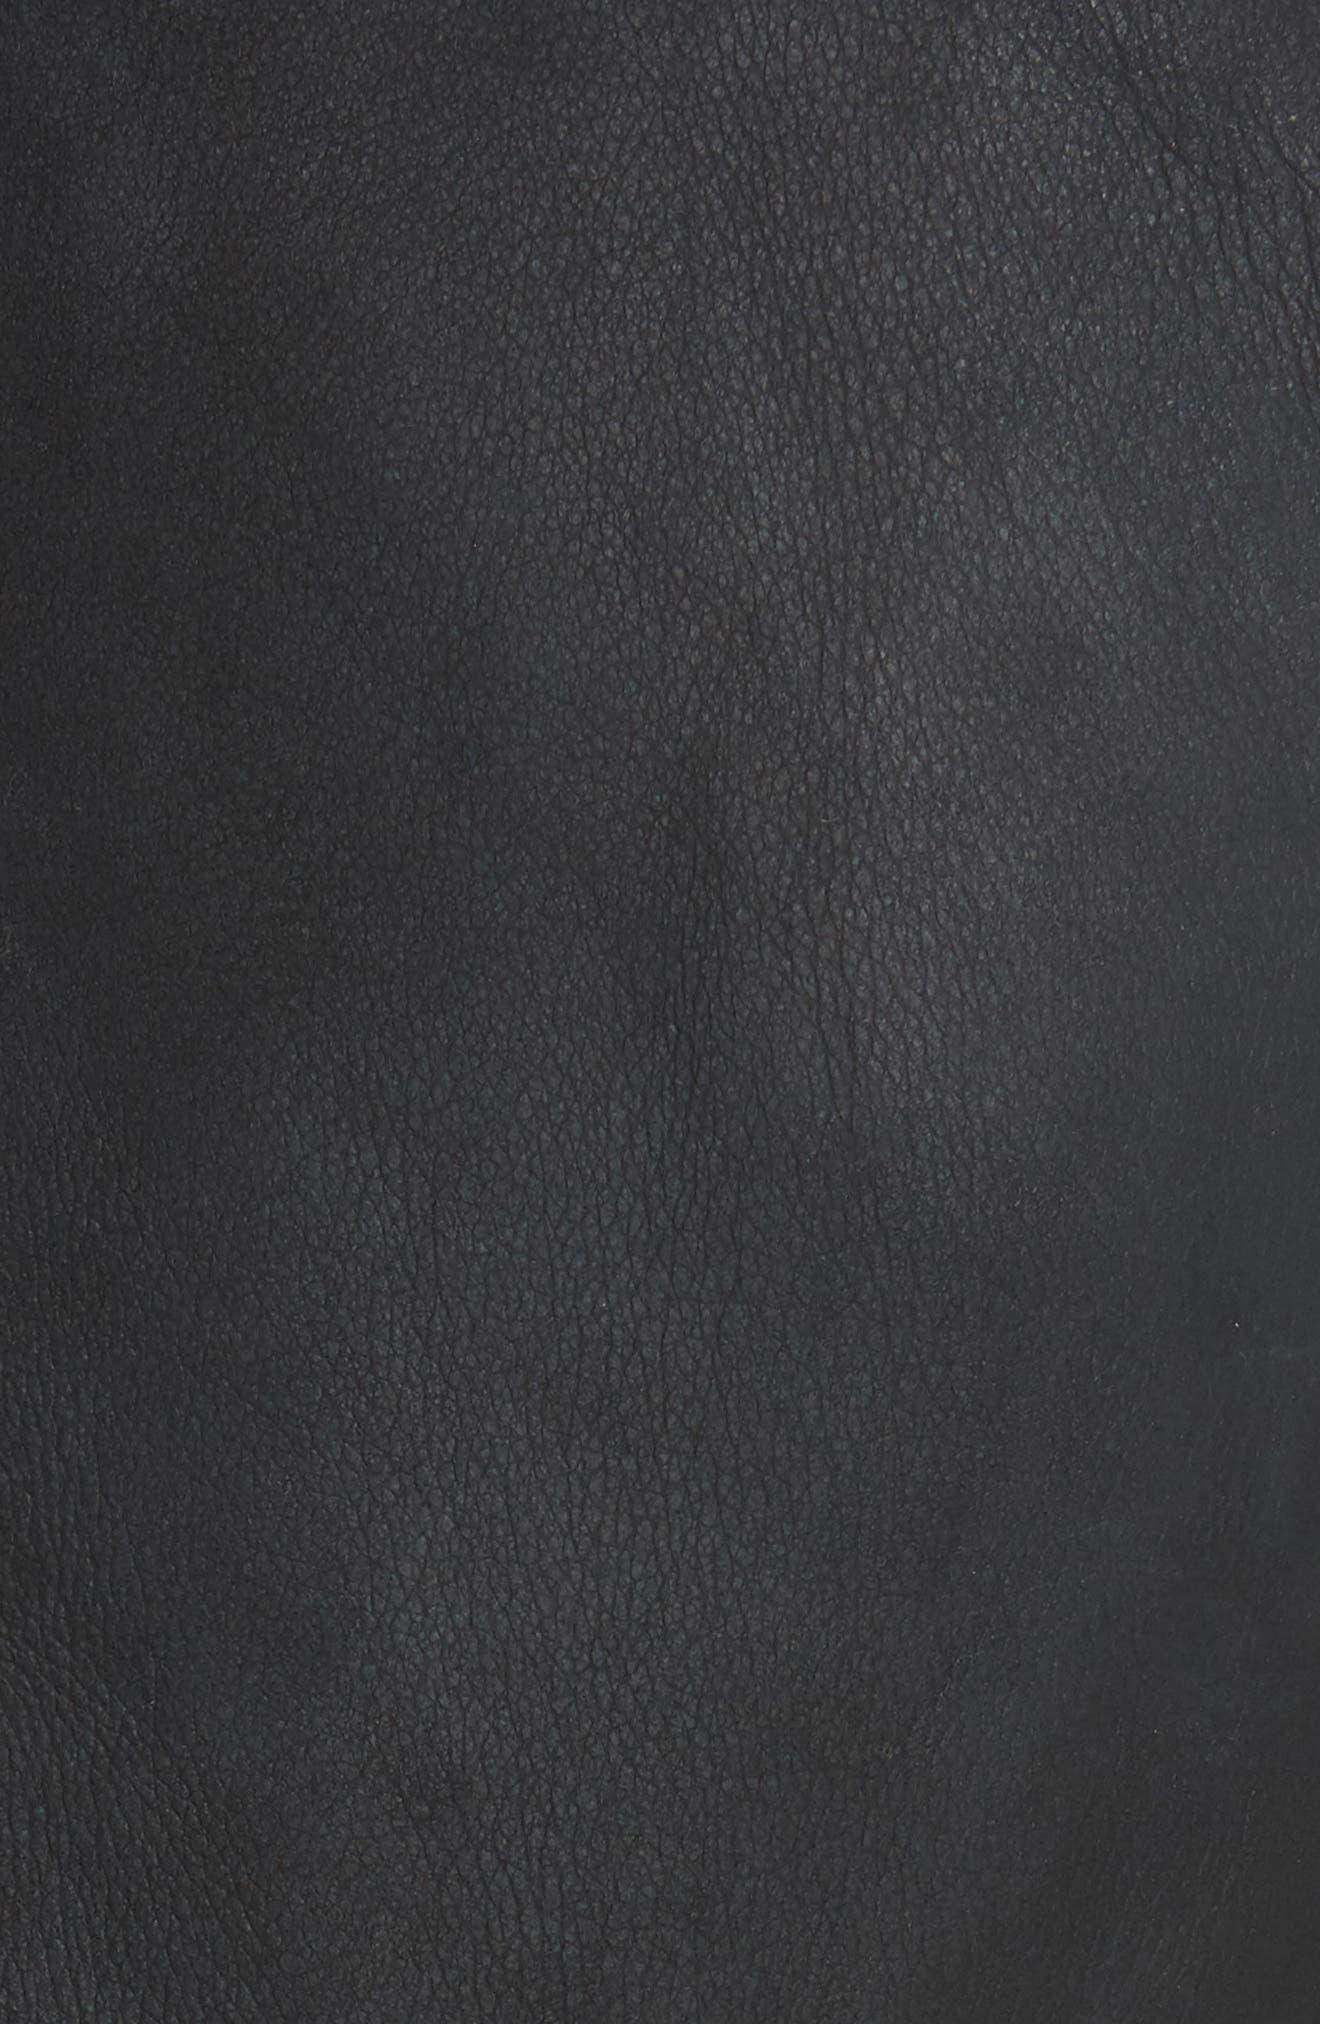 Genuine Toscana Shearling Vest,                             Alternate thumbnail 6, color,                             BLACK